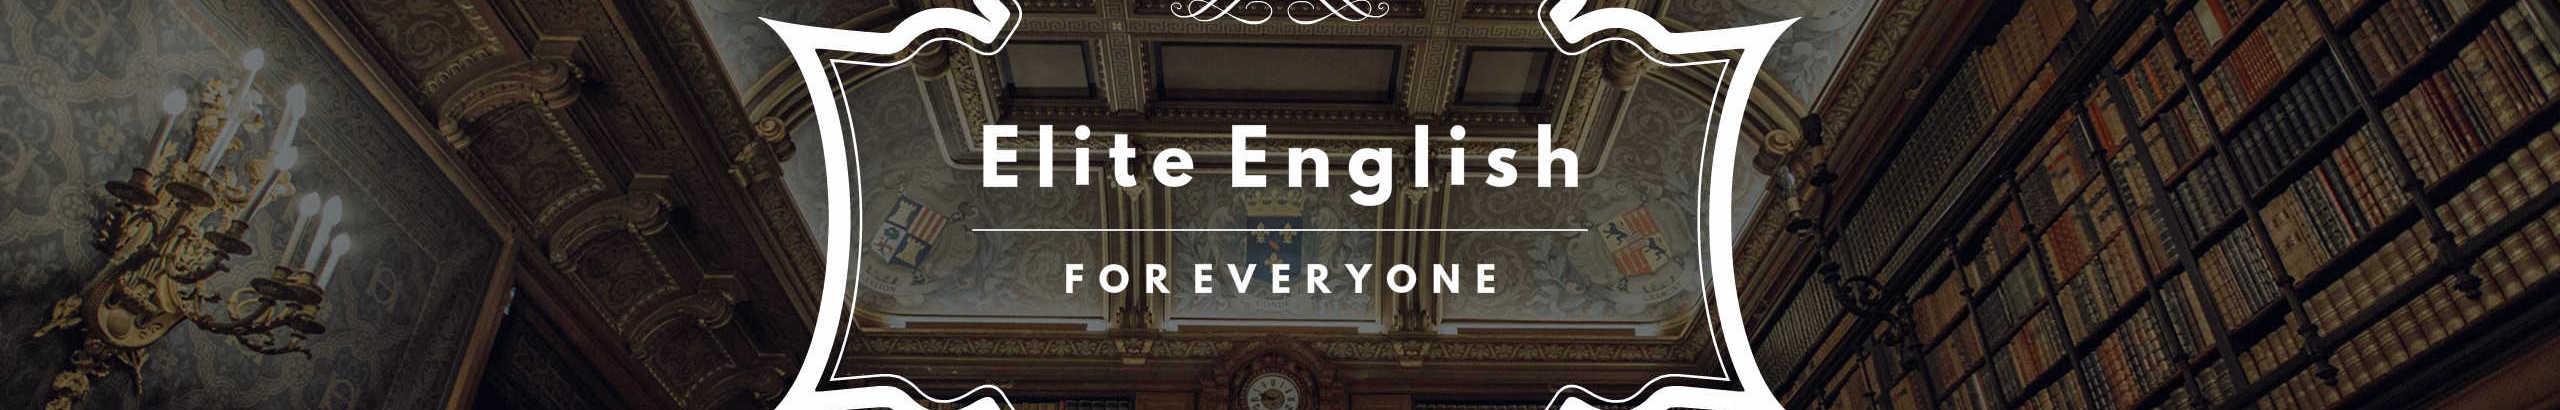 EliteEnglishTraining banner